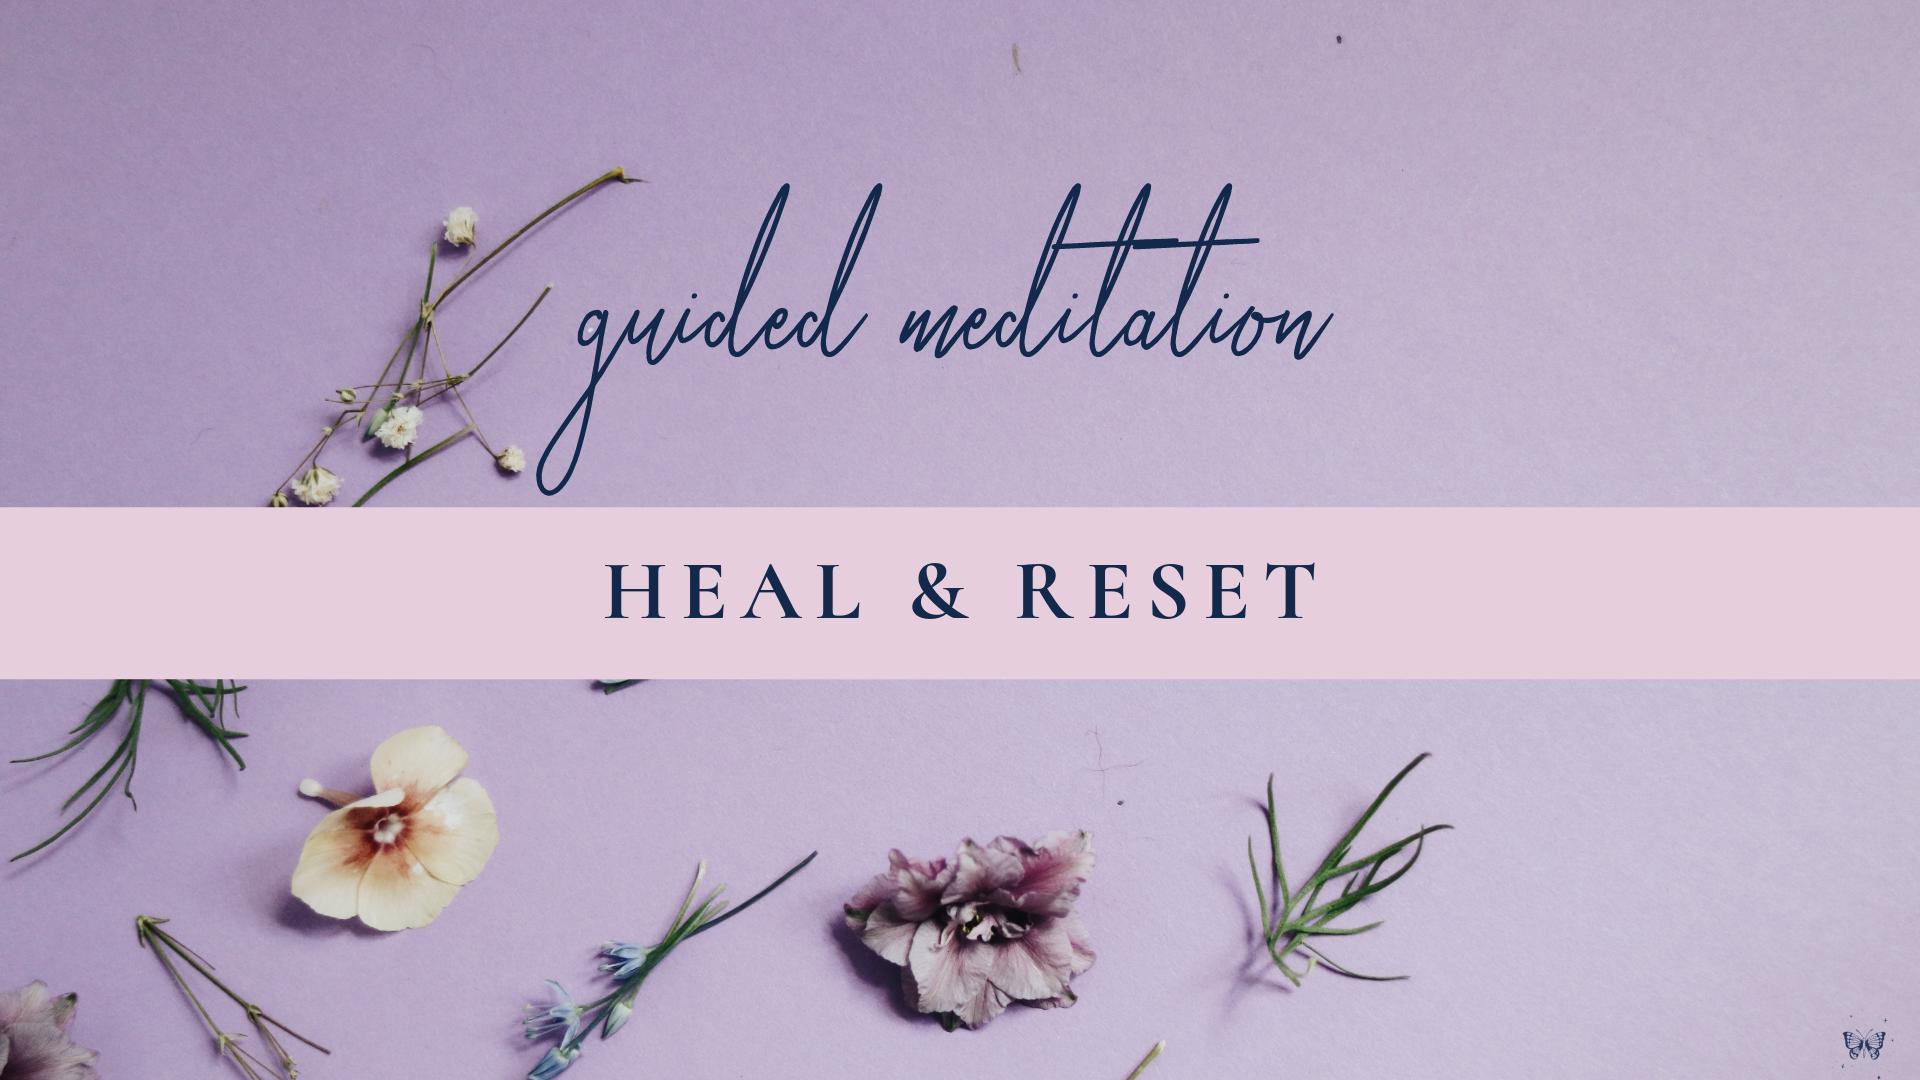 HealResetGuidedMeditation.png